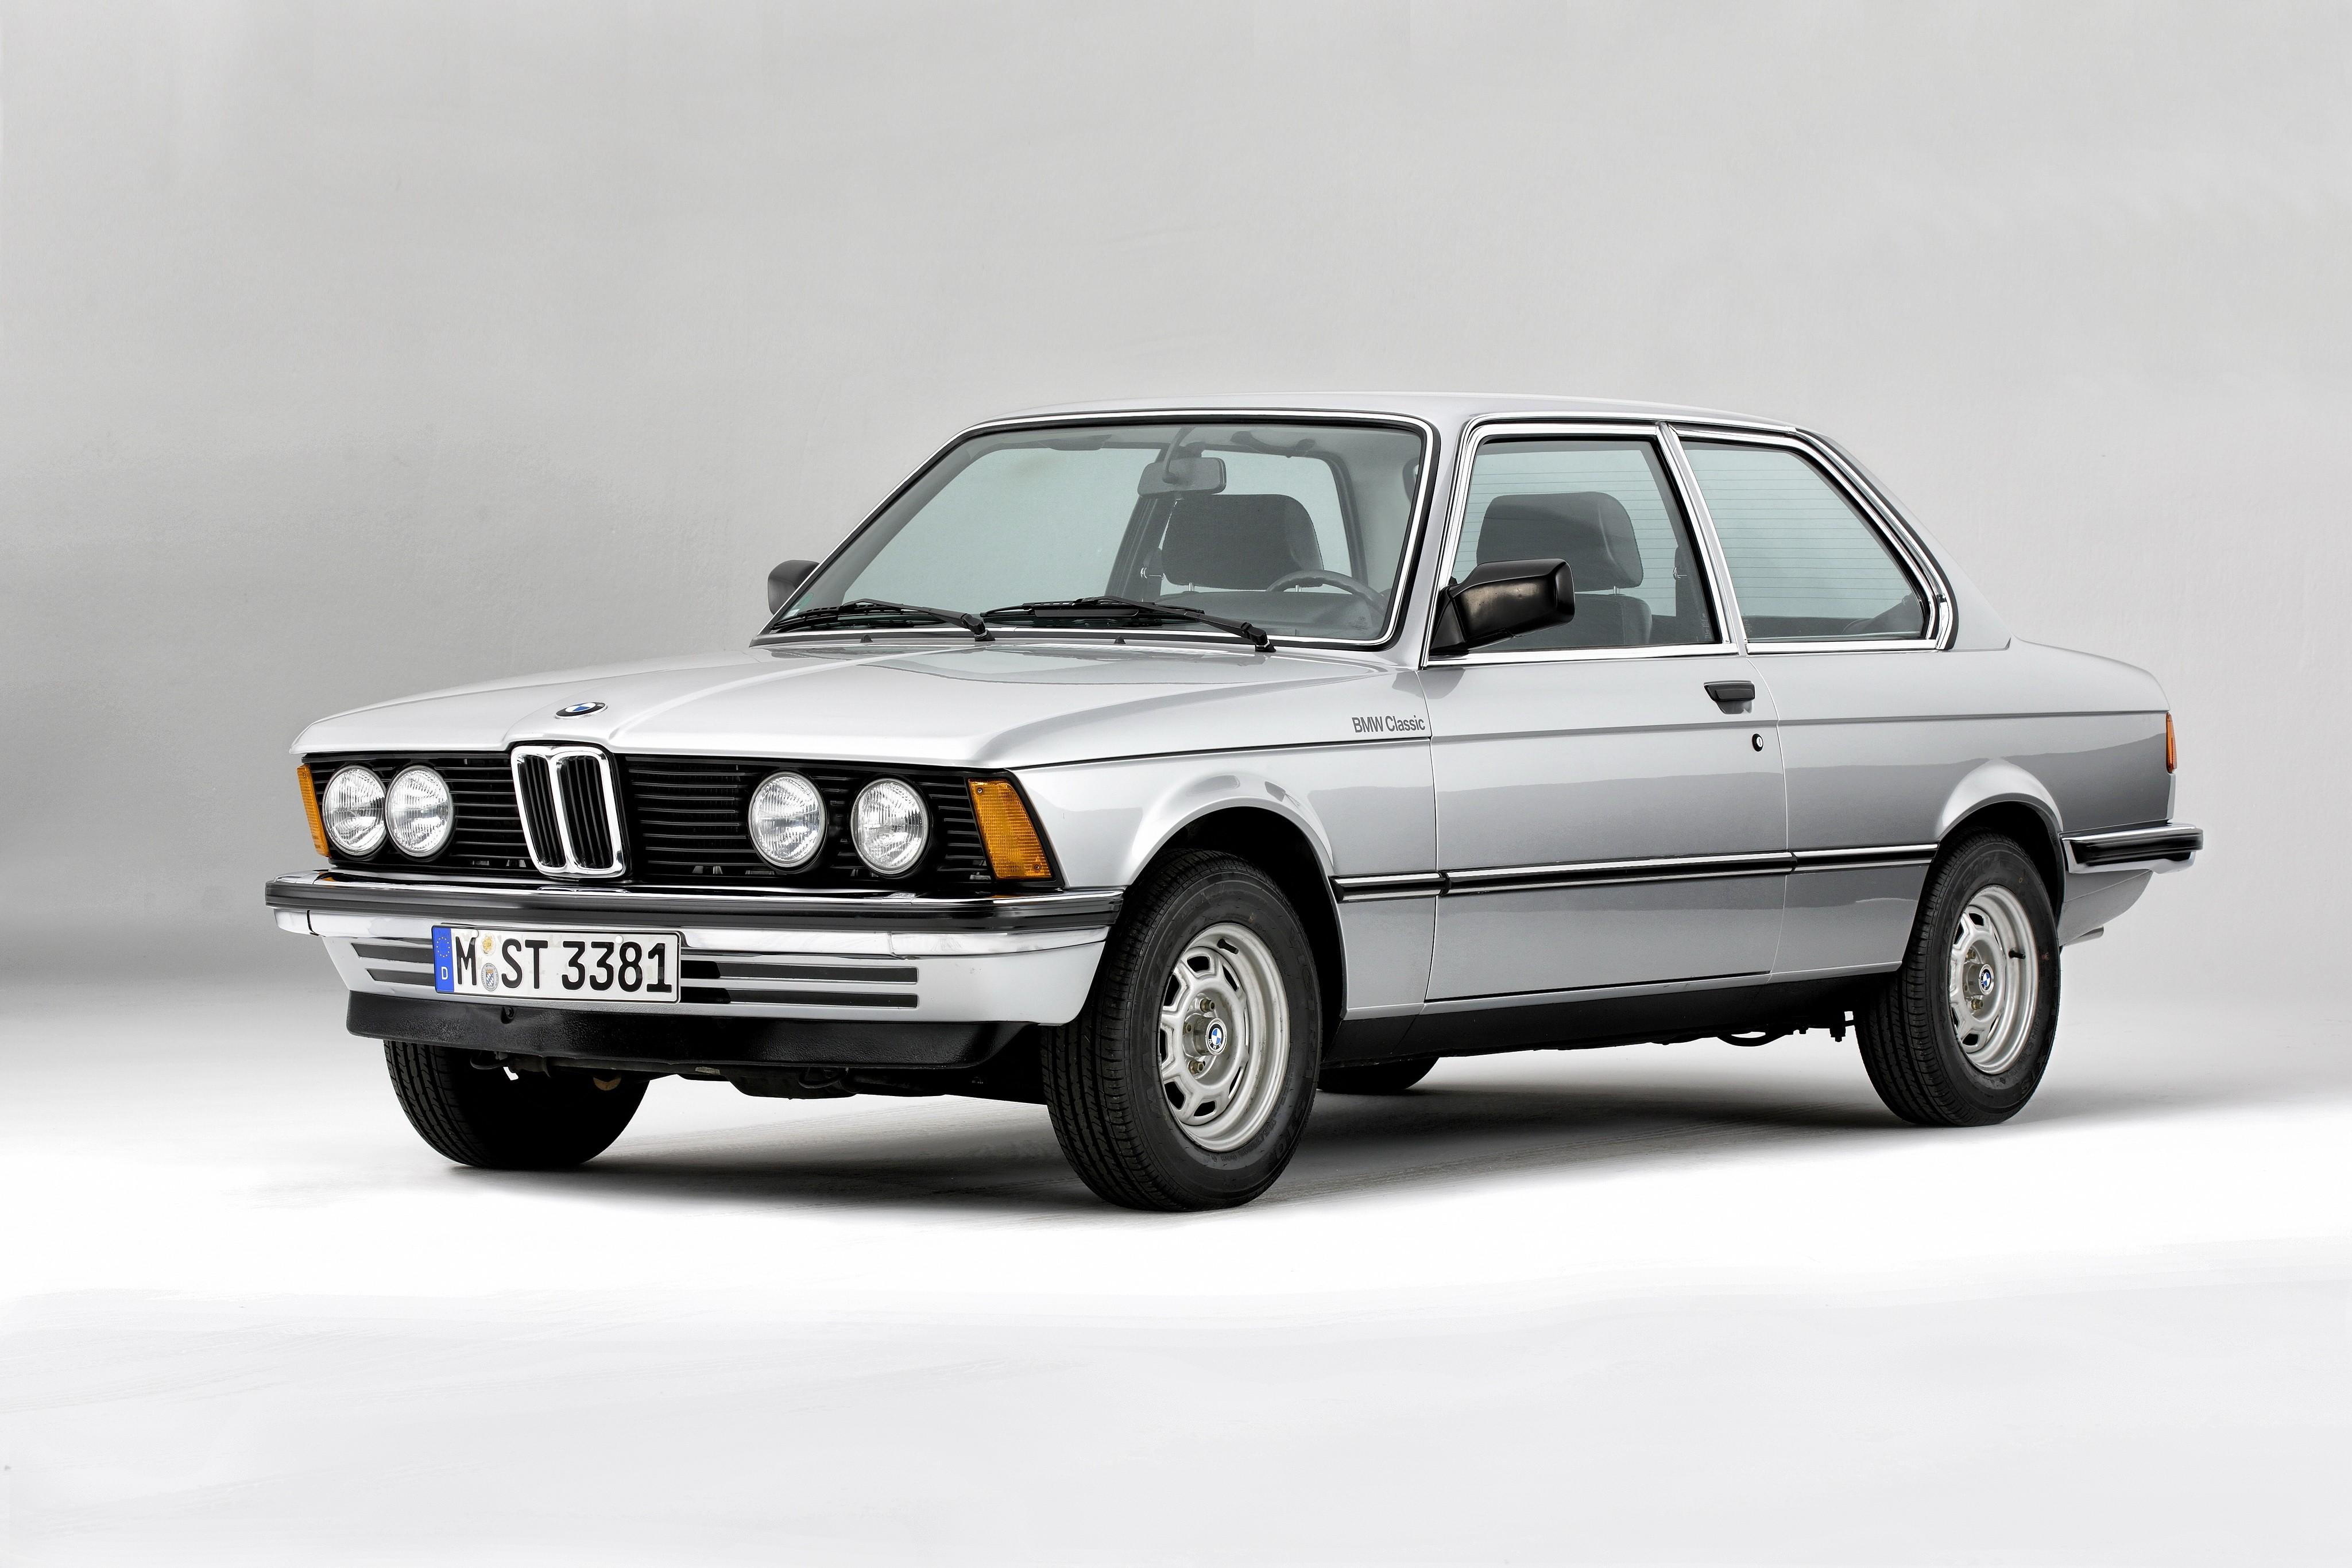 bmw 3 series coupe e21 1975 1976 1977 1978 1979 1980 1981 1982 1983 autoevolution. Black Bedroom Furniture Sets. Home Design Ideas